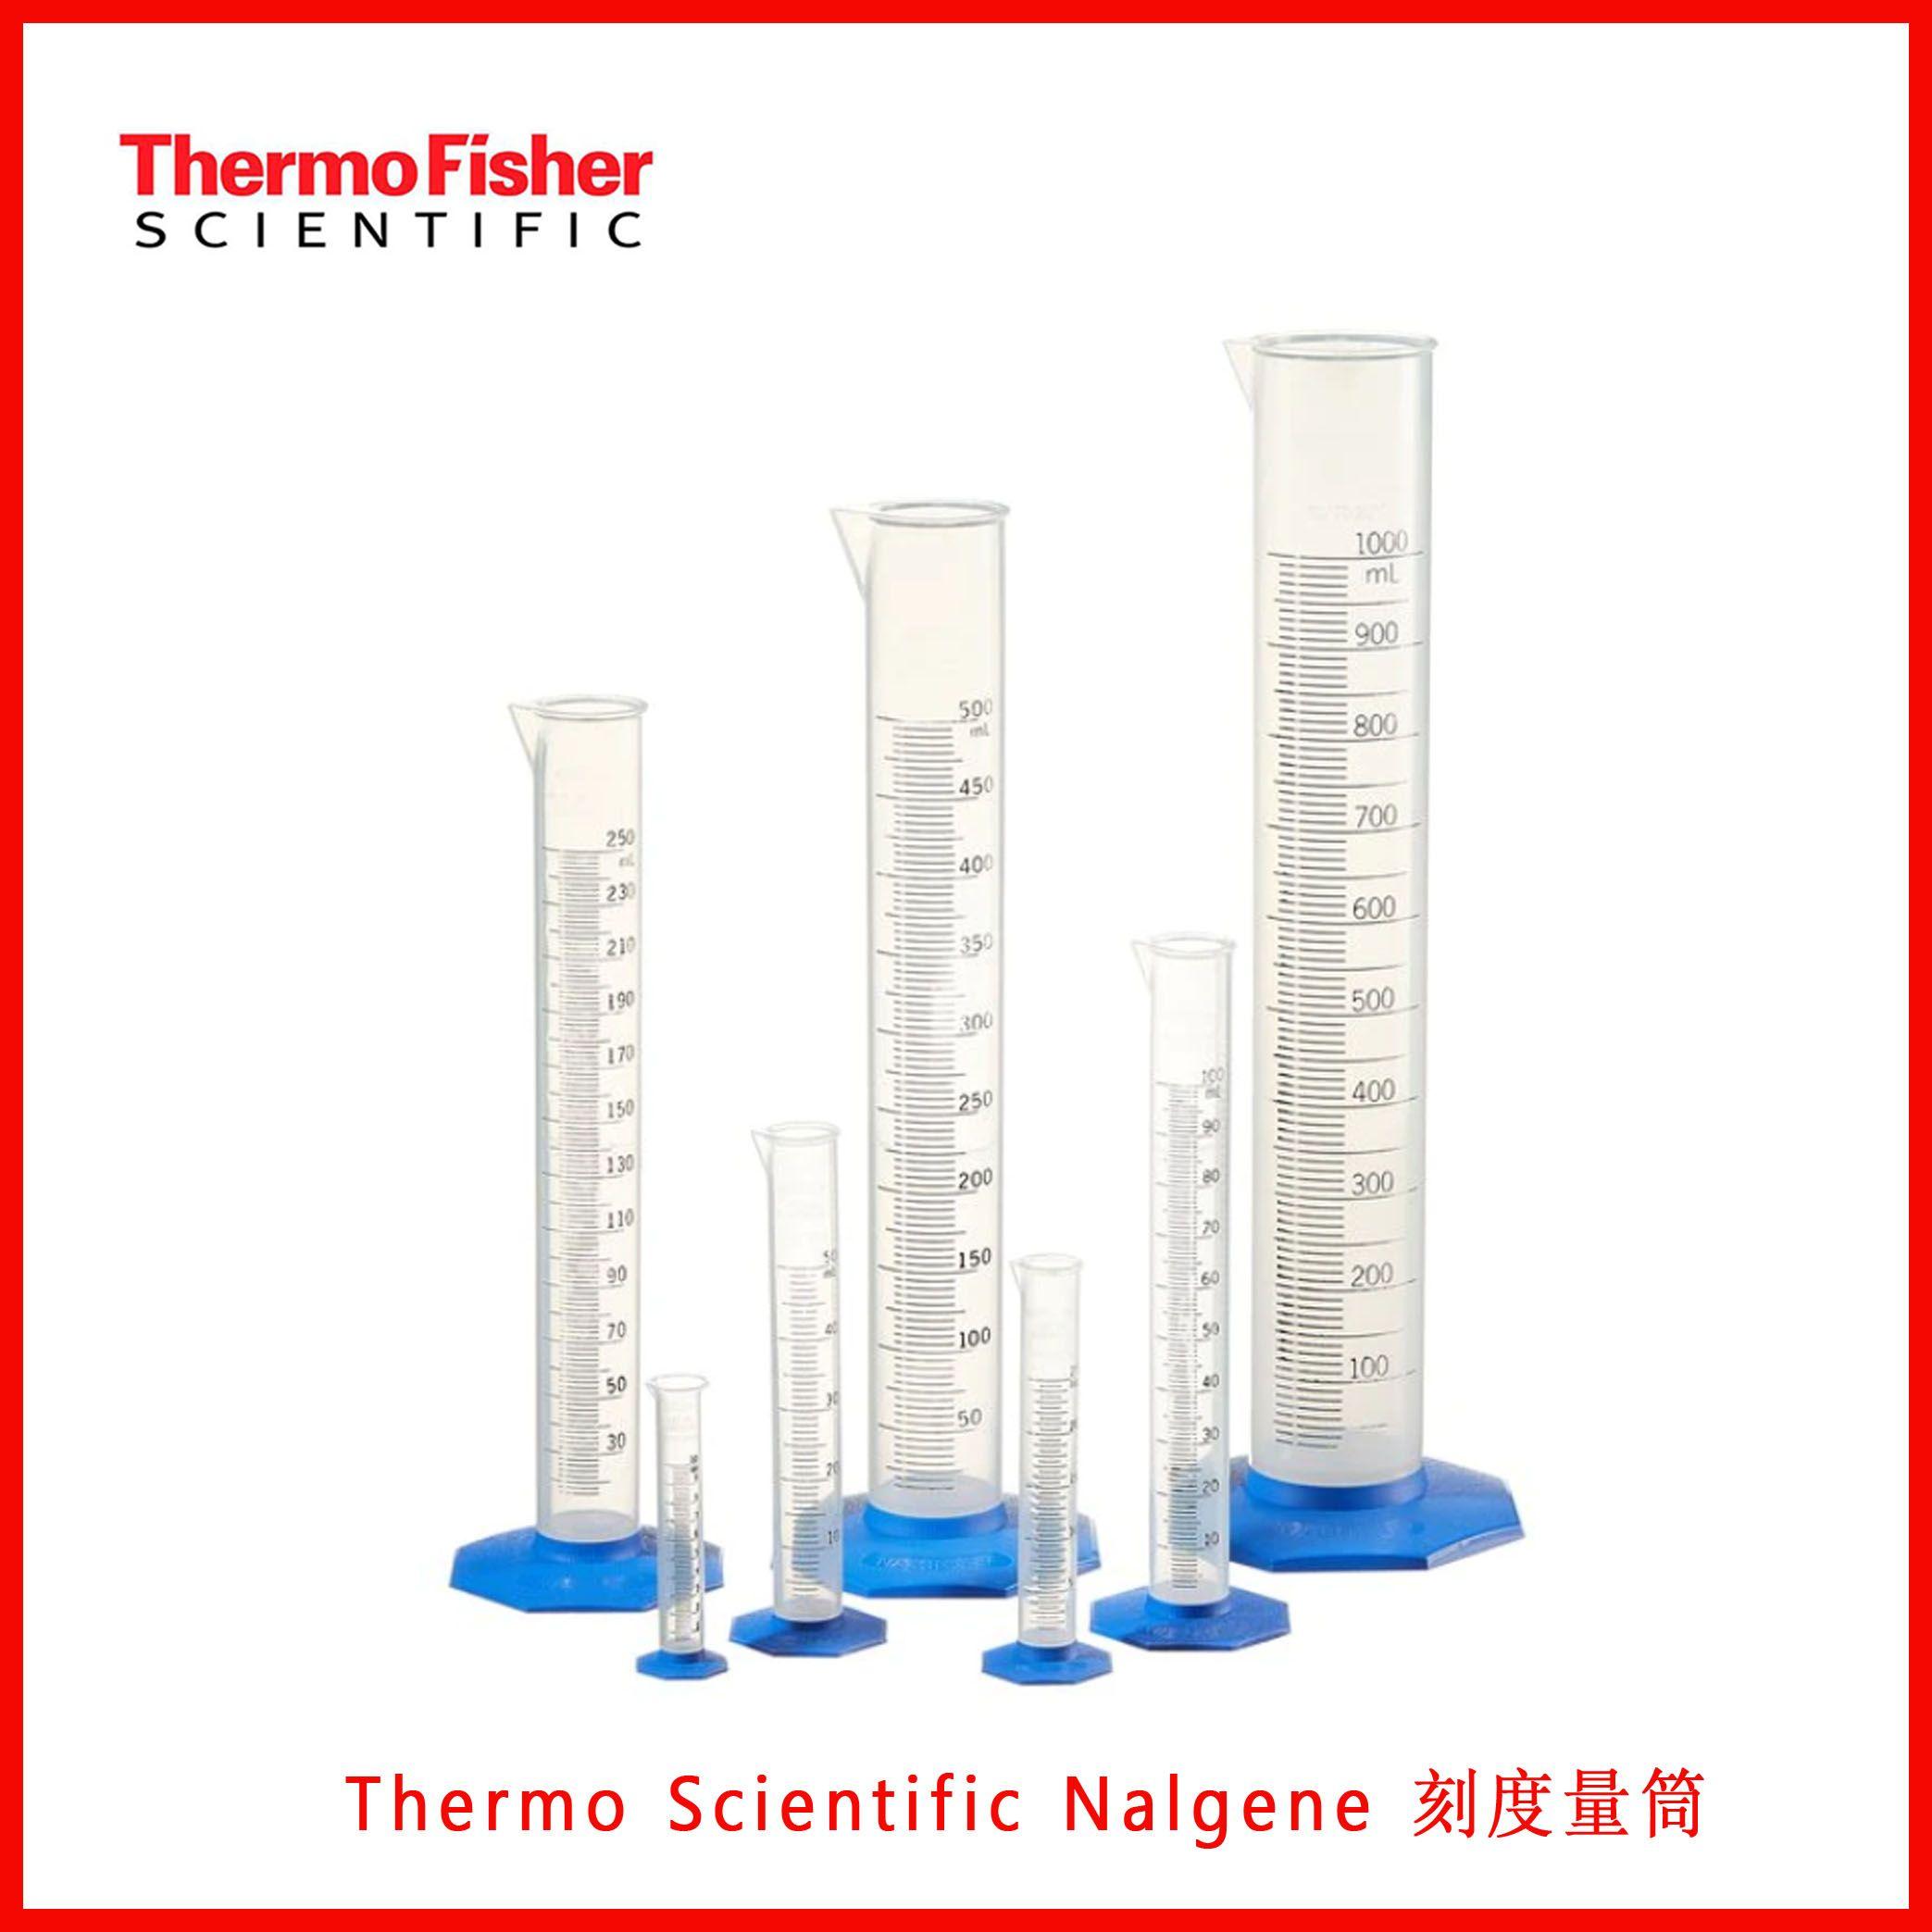 Thermo Scientific Nalgene 刻度量筒36630010,36630025,36630050,现货